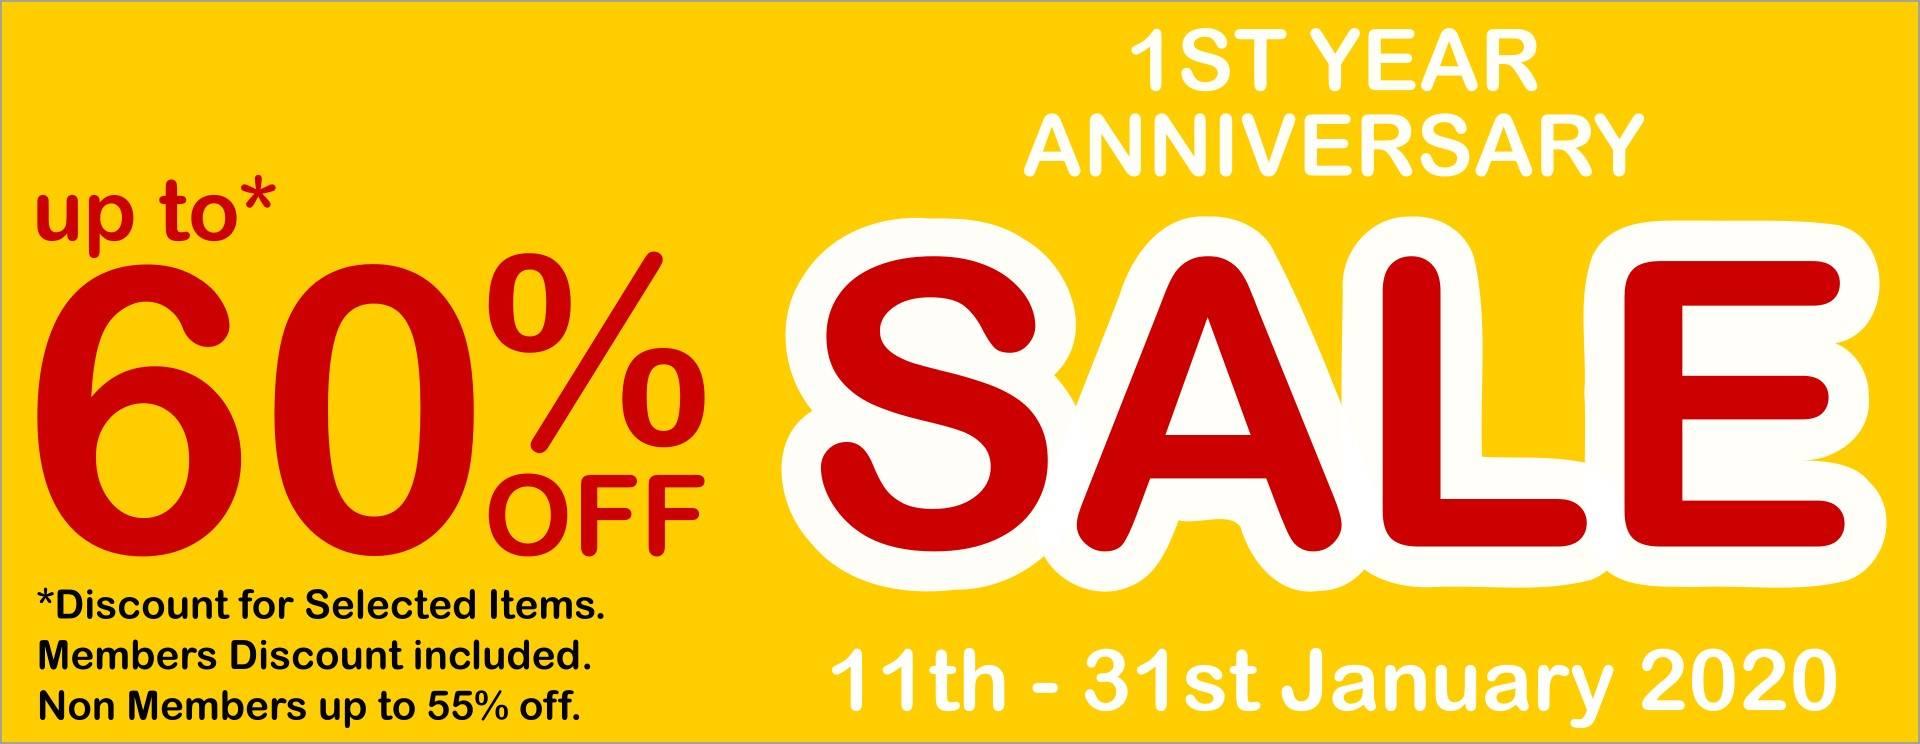 1st Year Anniversary Sale